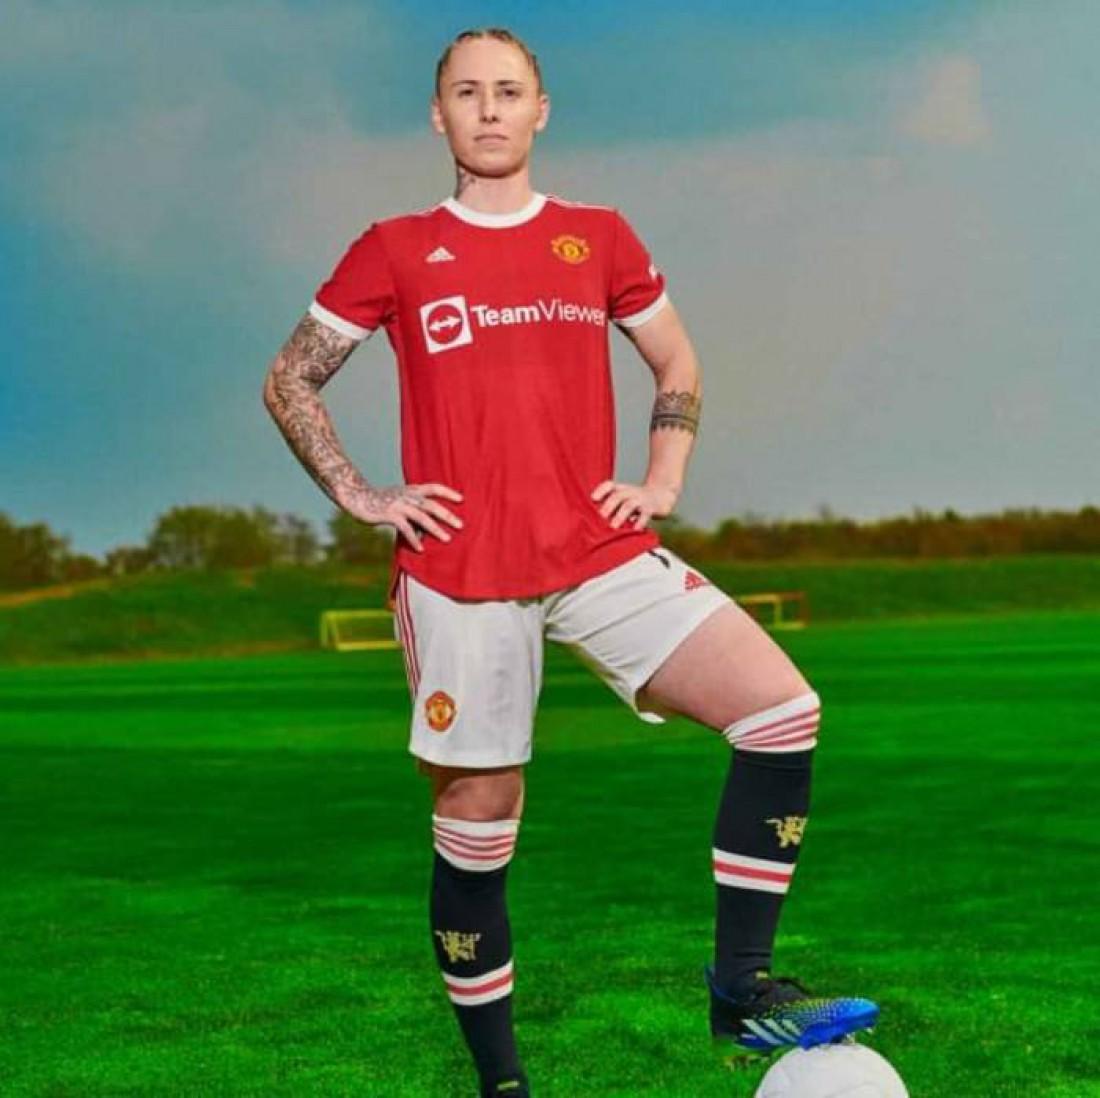 Манчестер Юнайтед представил новую домашнюю форму